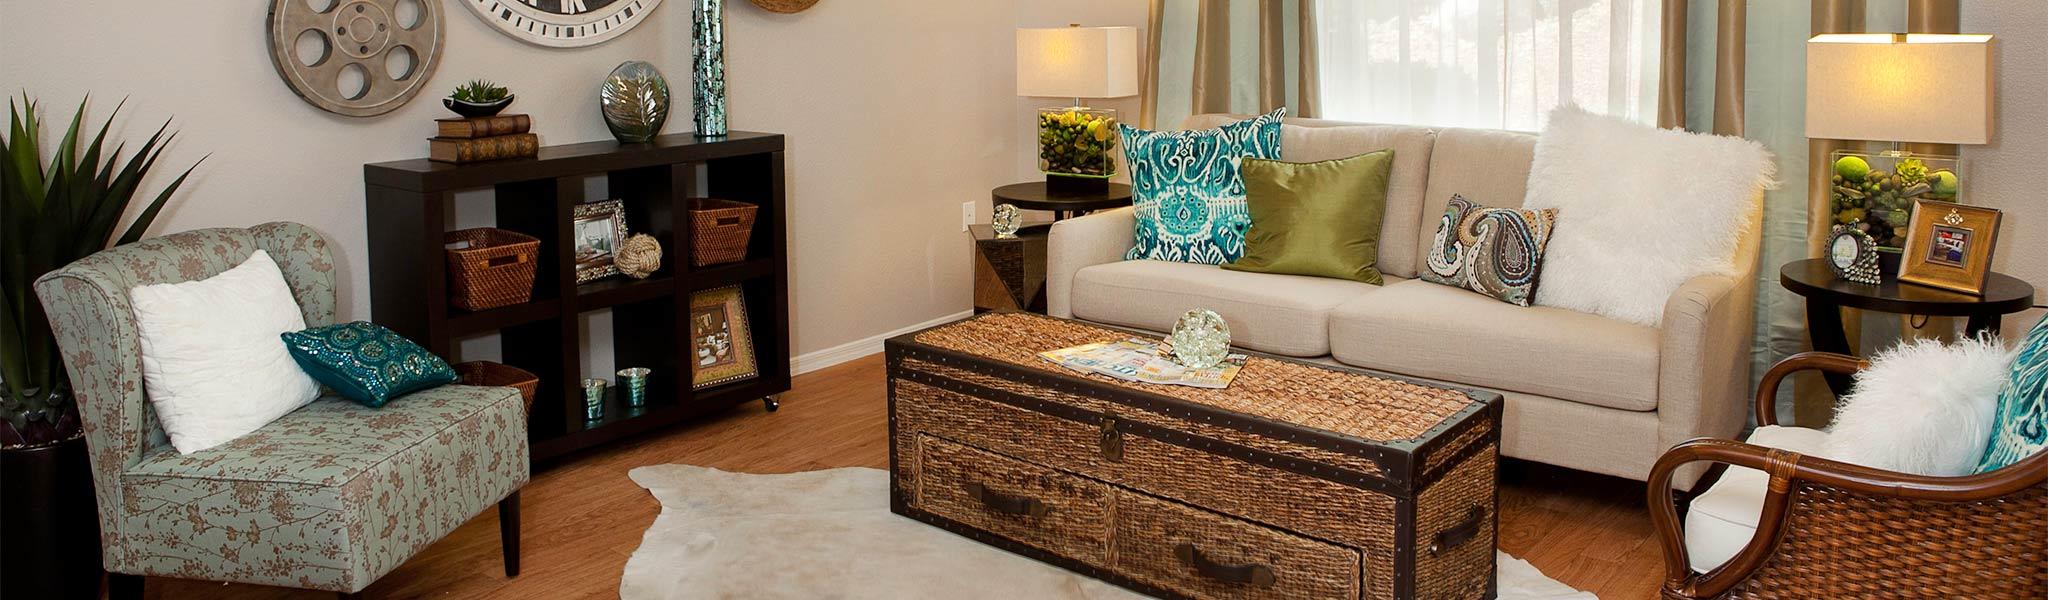 Apartments For Rent In Brunswick GA